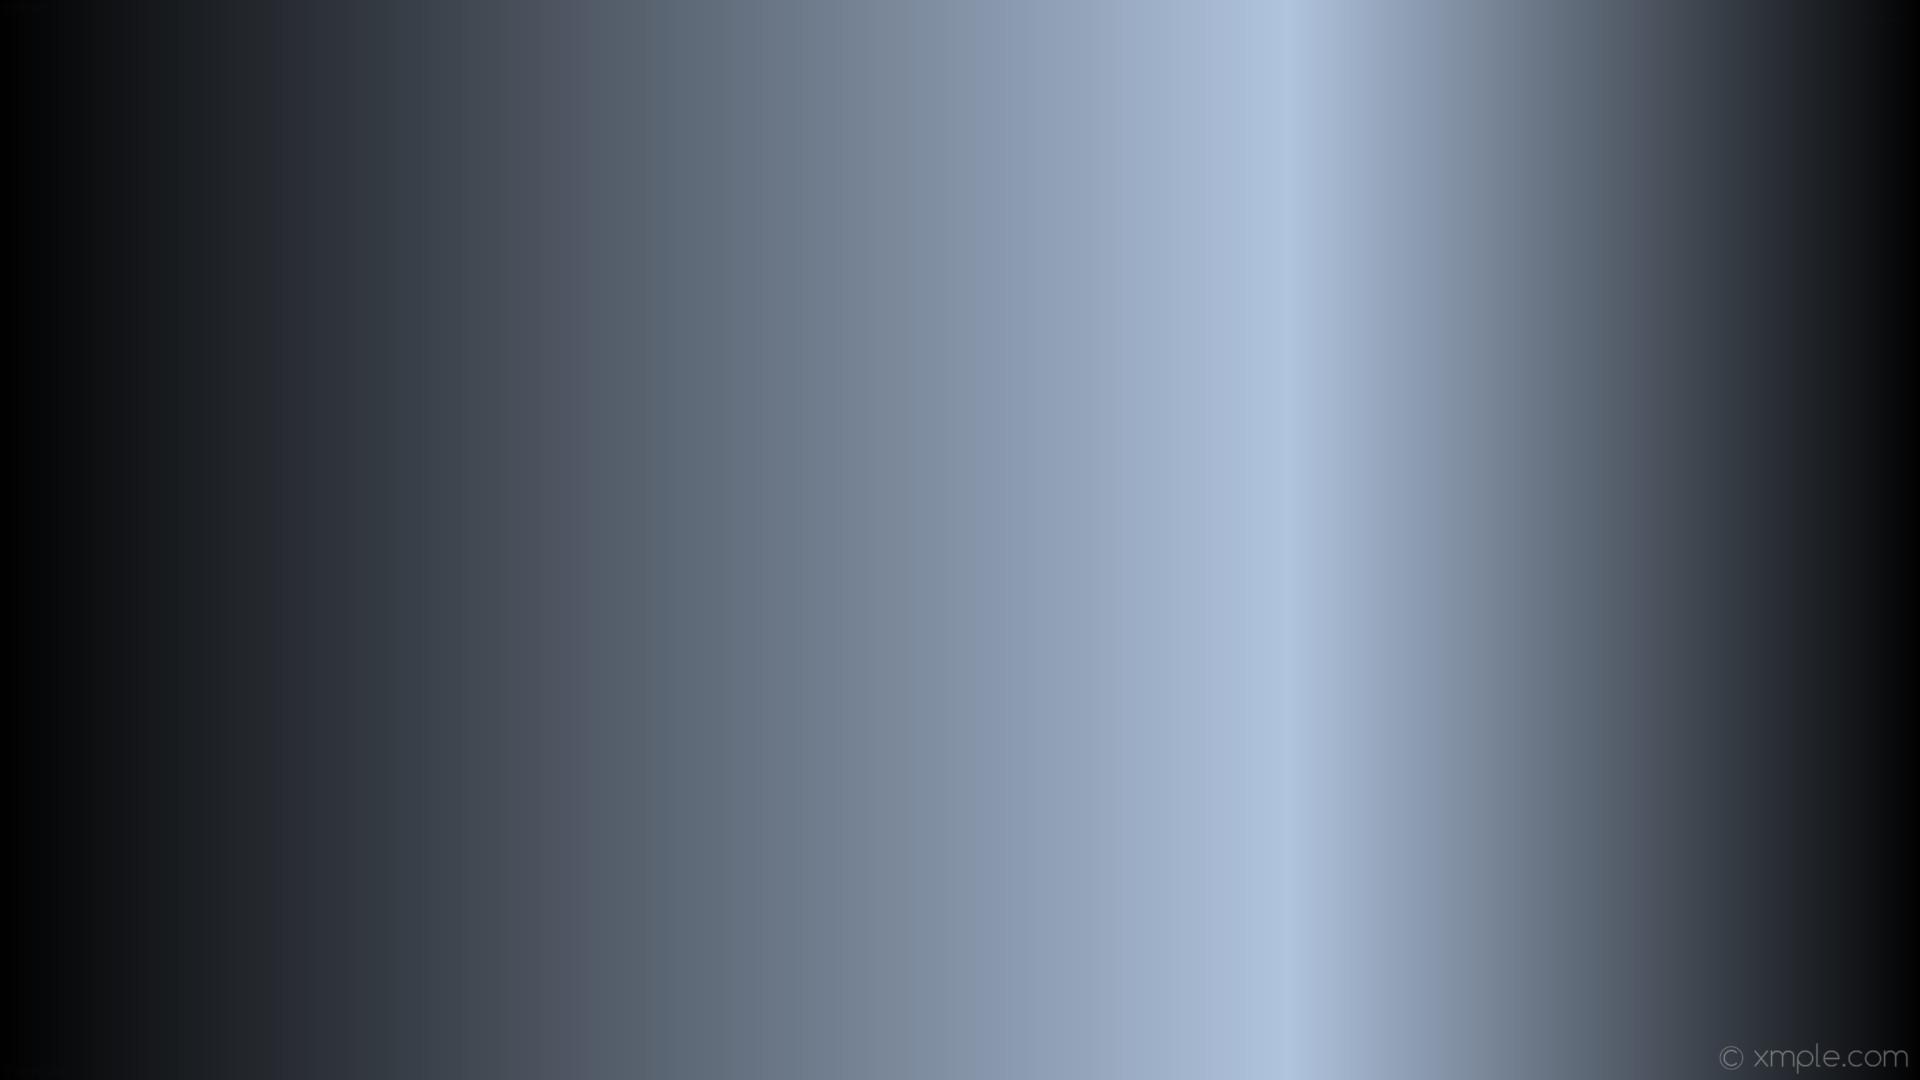 wallpaper linear highlight blue gradient black light steel blue #000000  #b0c4de 0° 33